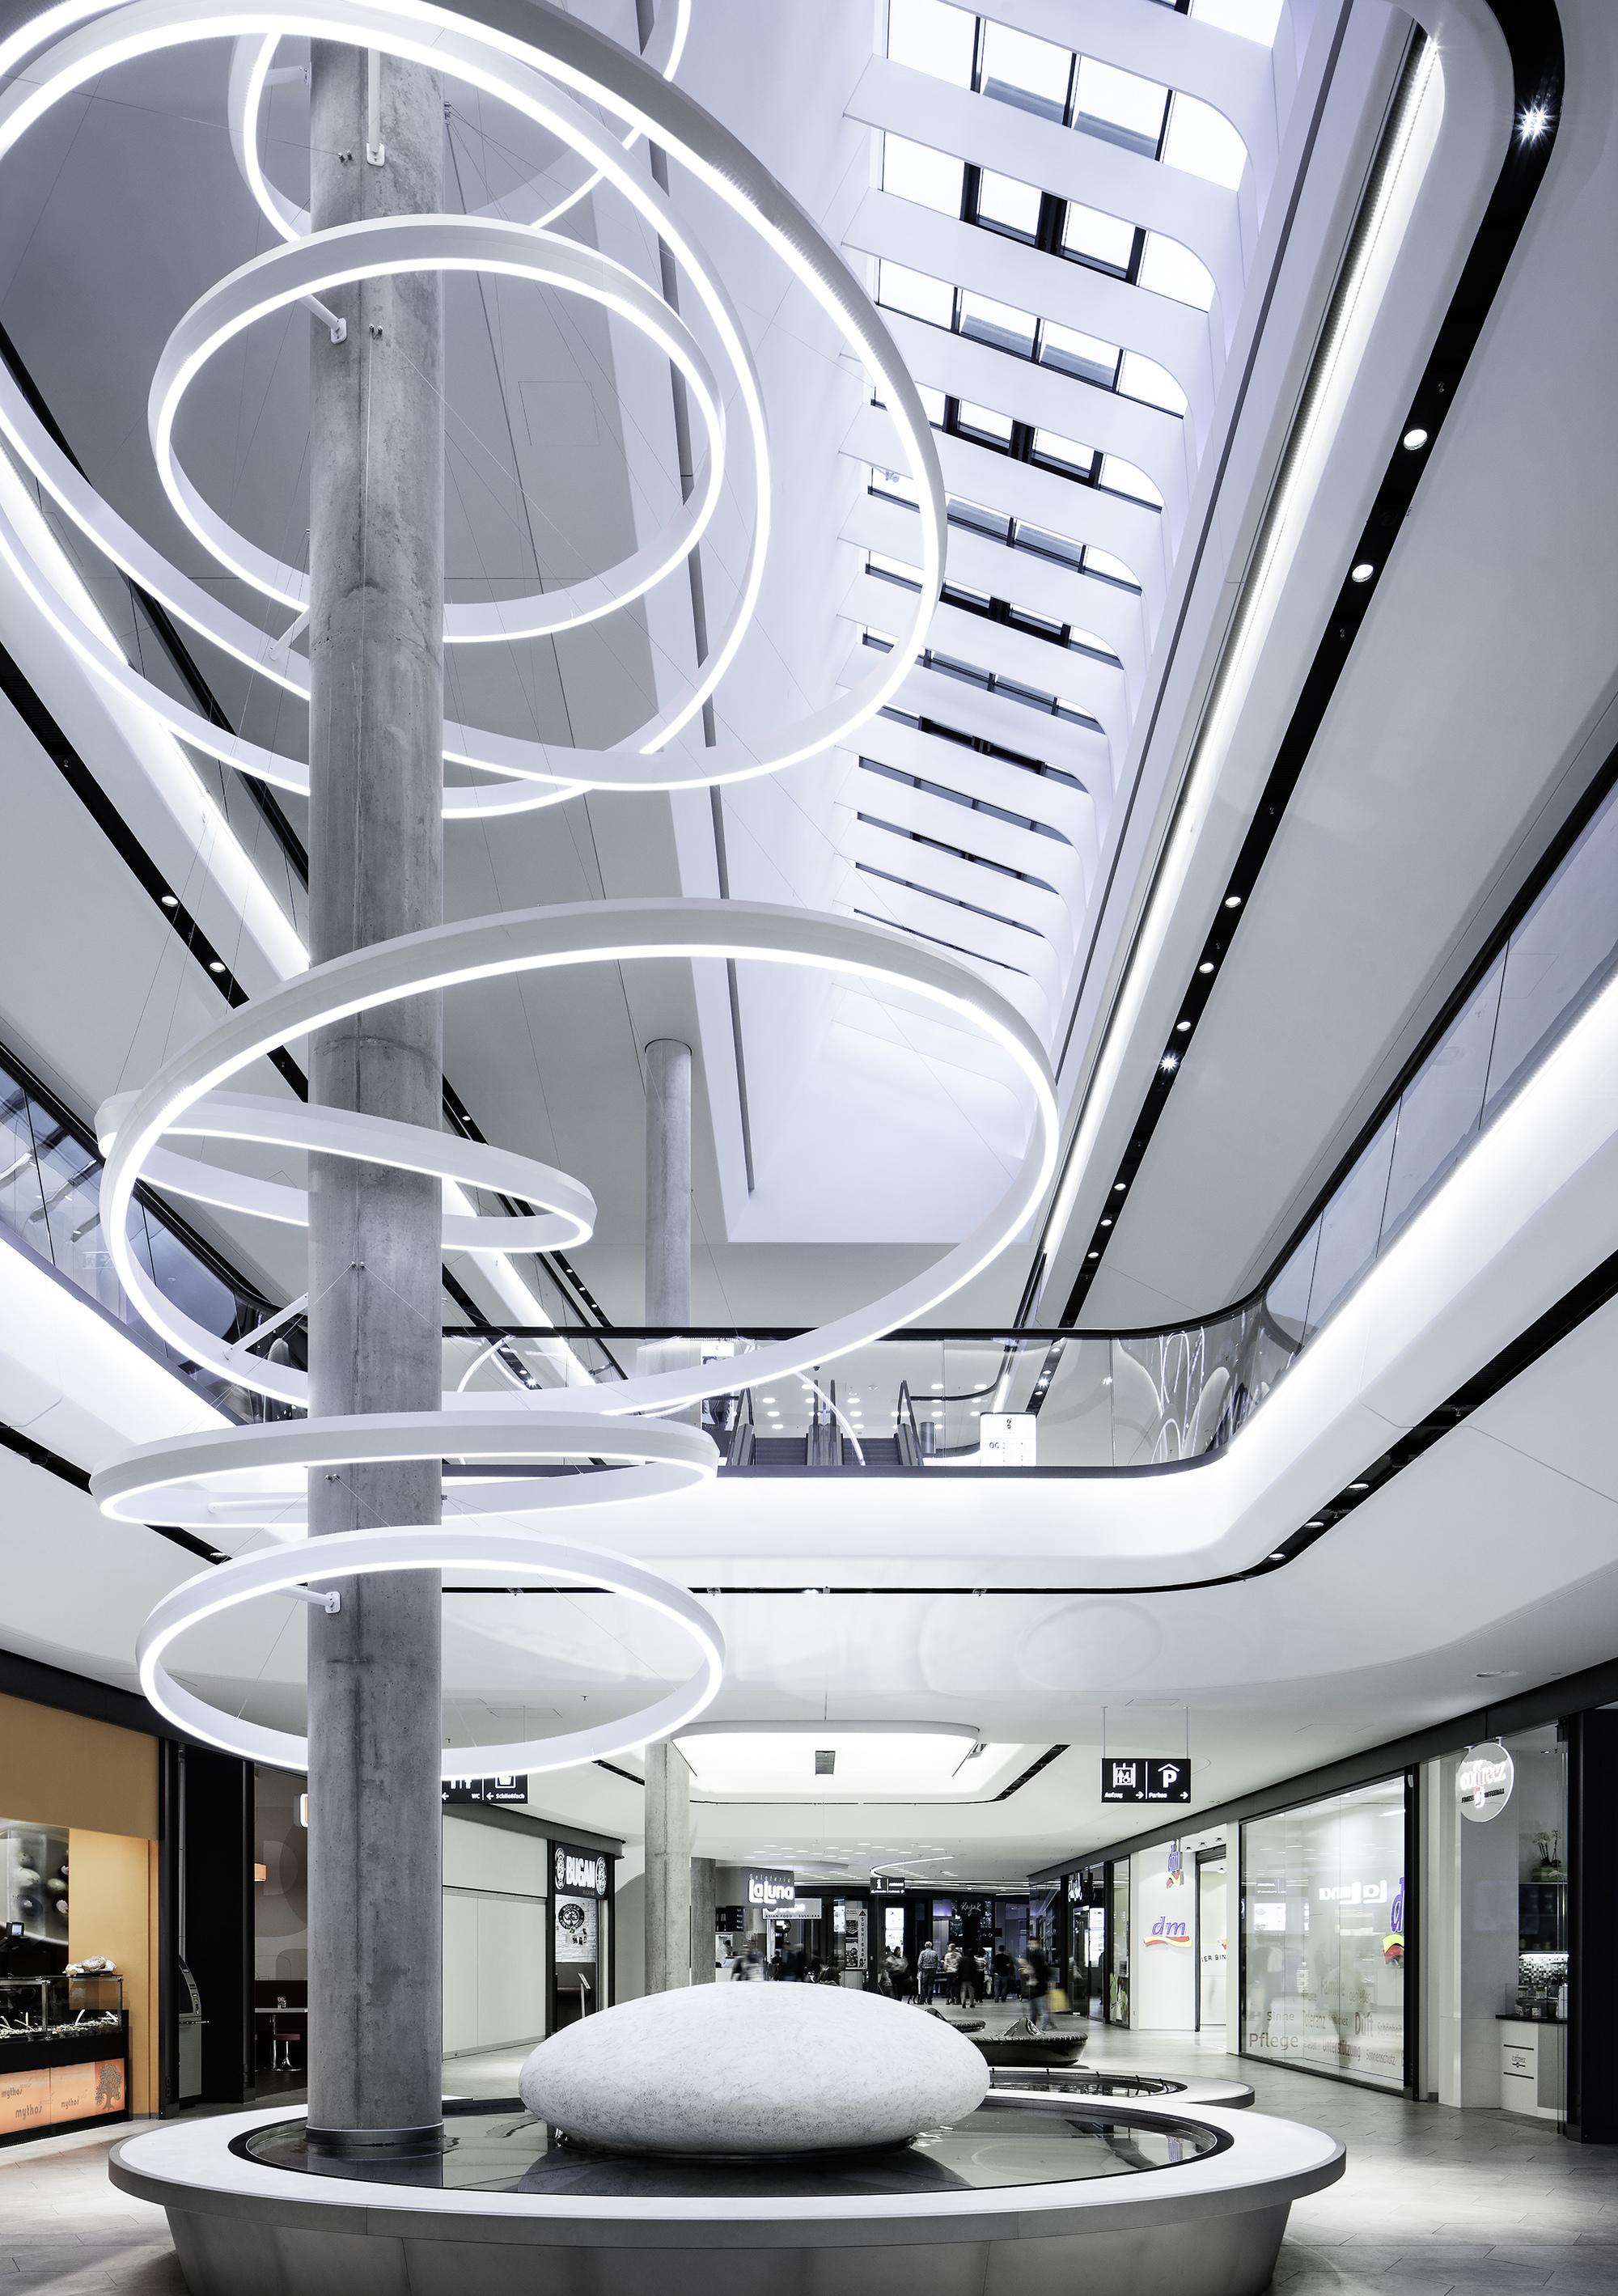 Innenarchitekturbüro Stuttgart gerber ippolito fleitz archdaily